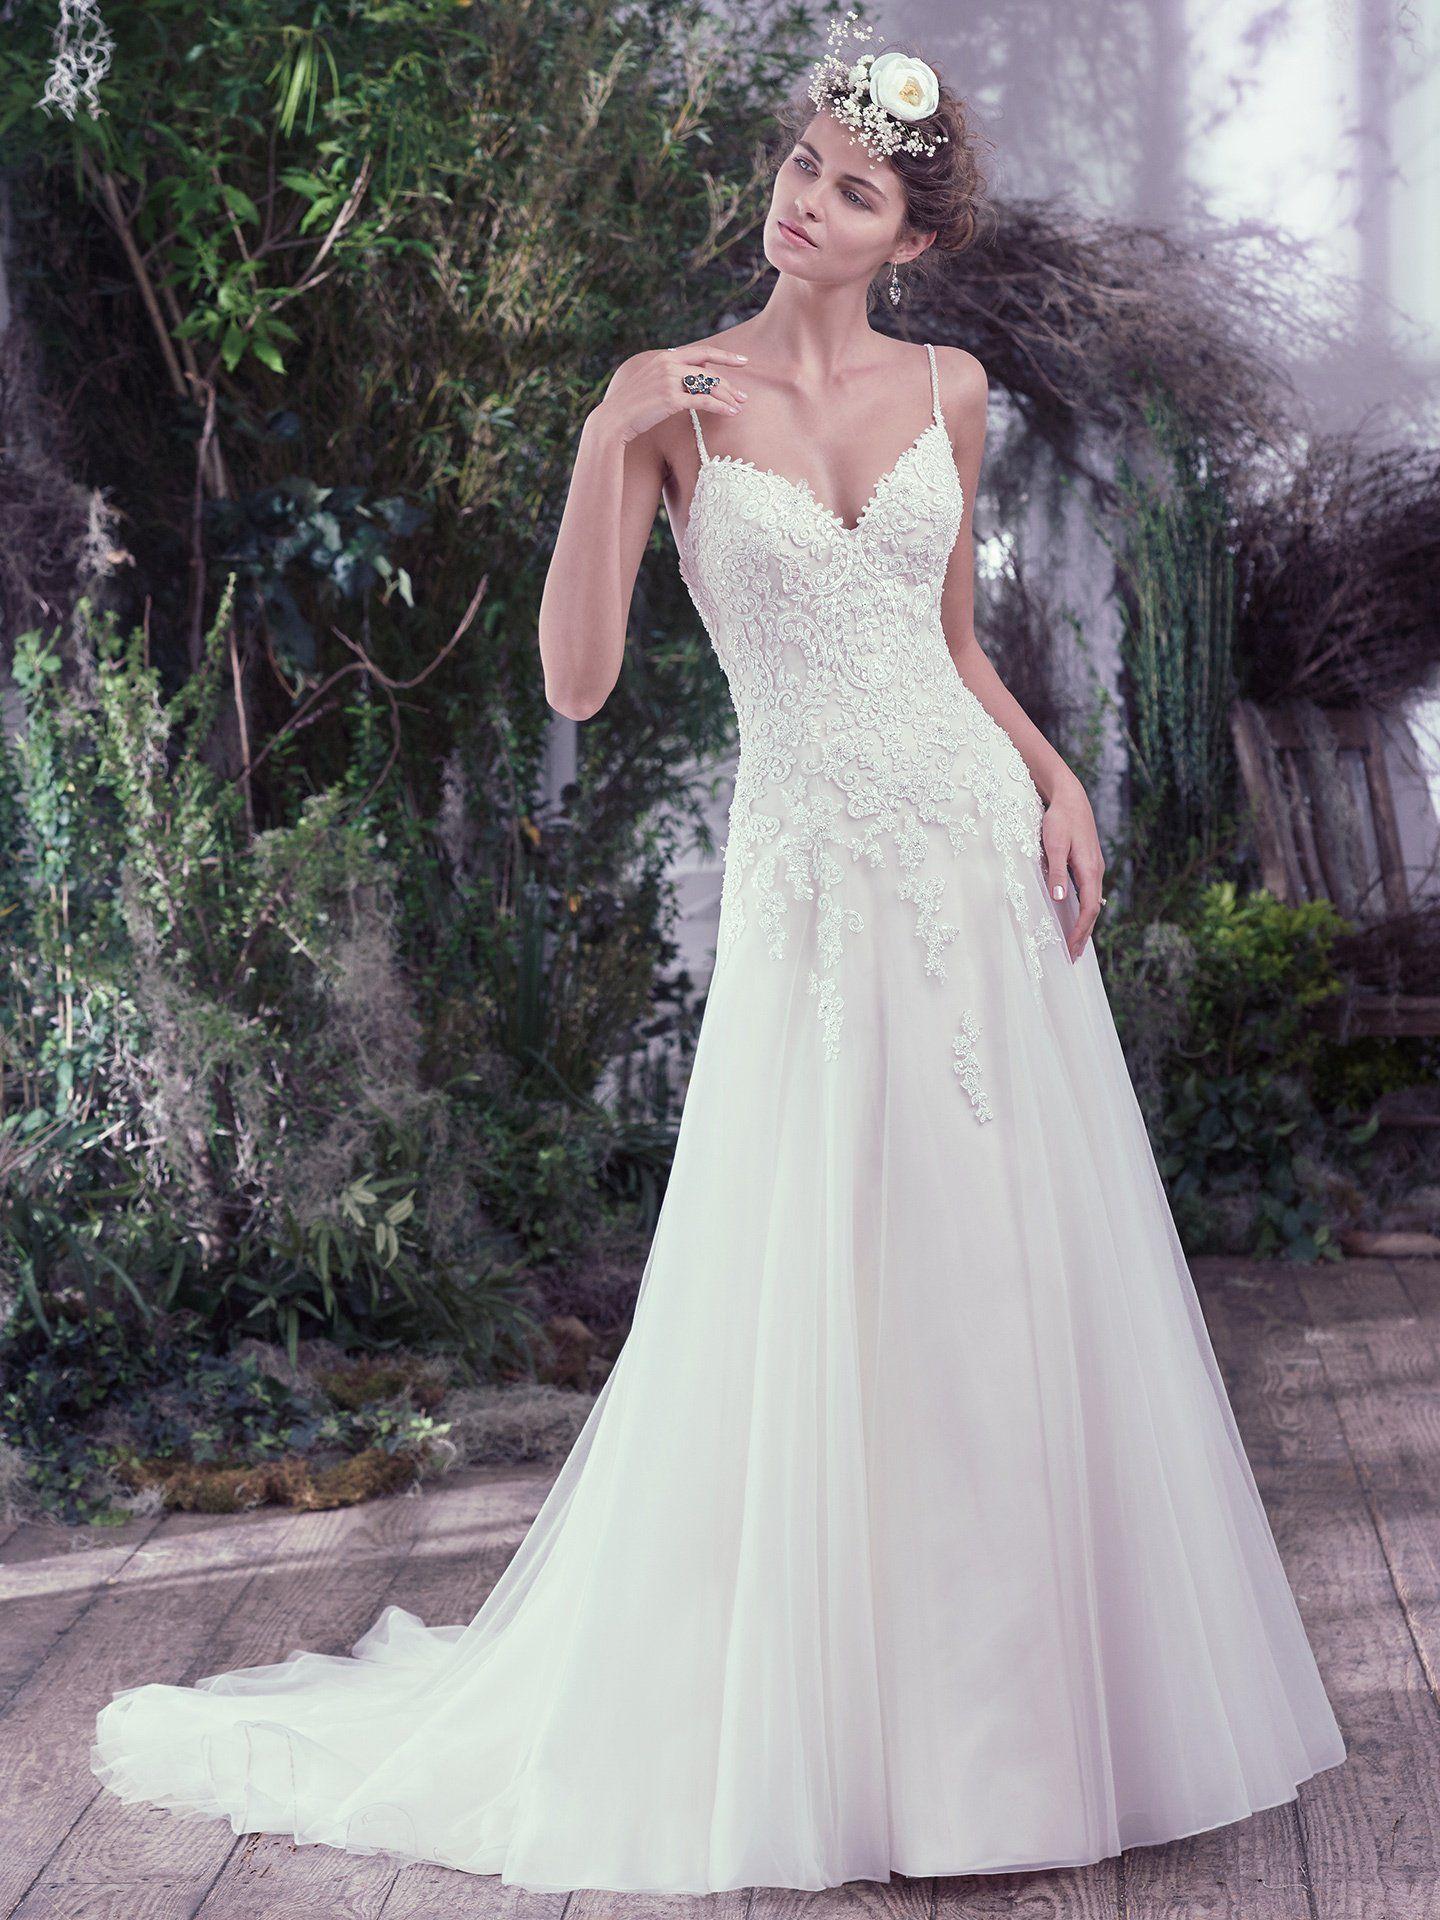 Beaded spaghetti strap wedding dresses  BETH by Maggie Sottero Wedding Dresses  Maggie Sottero Lisette